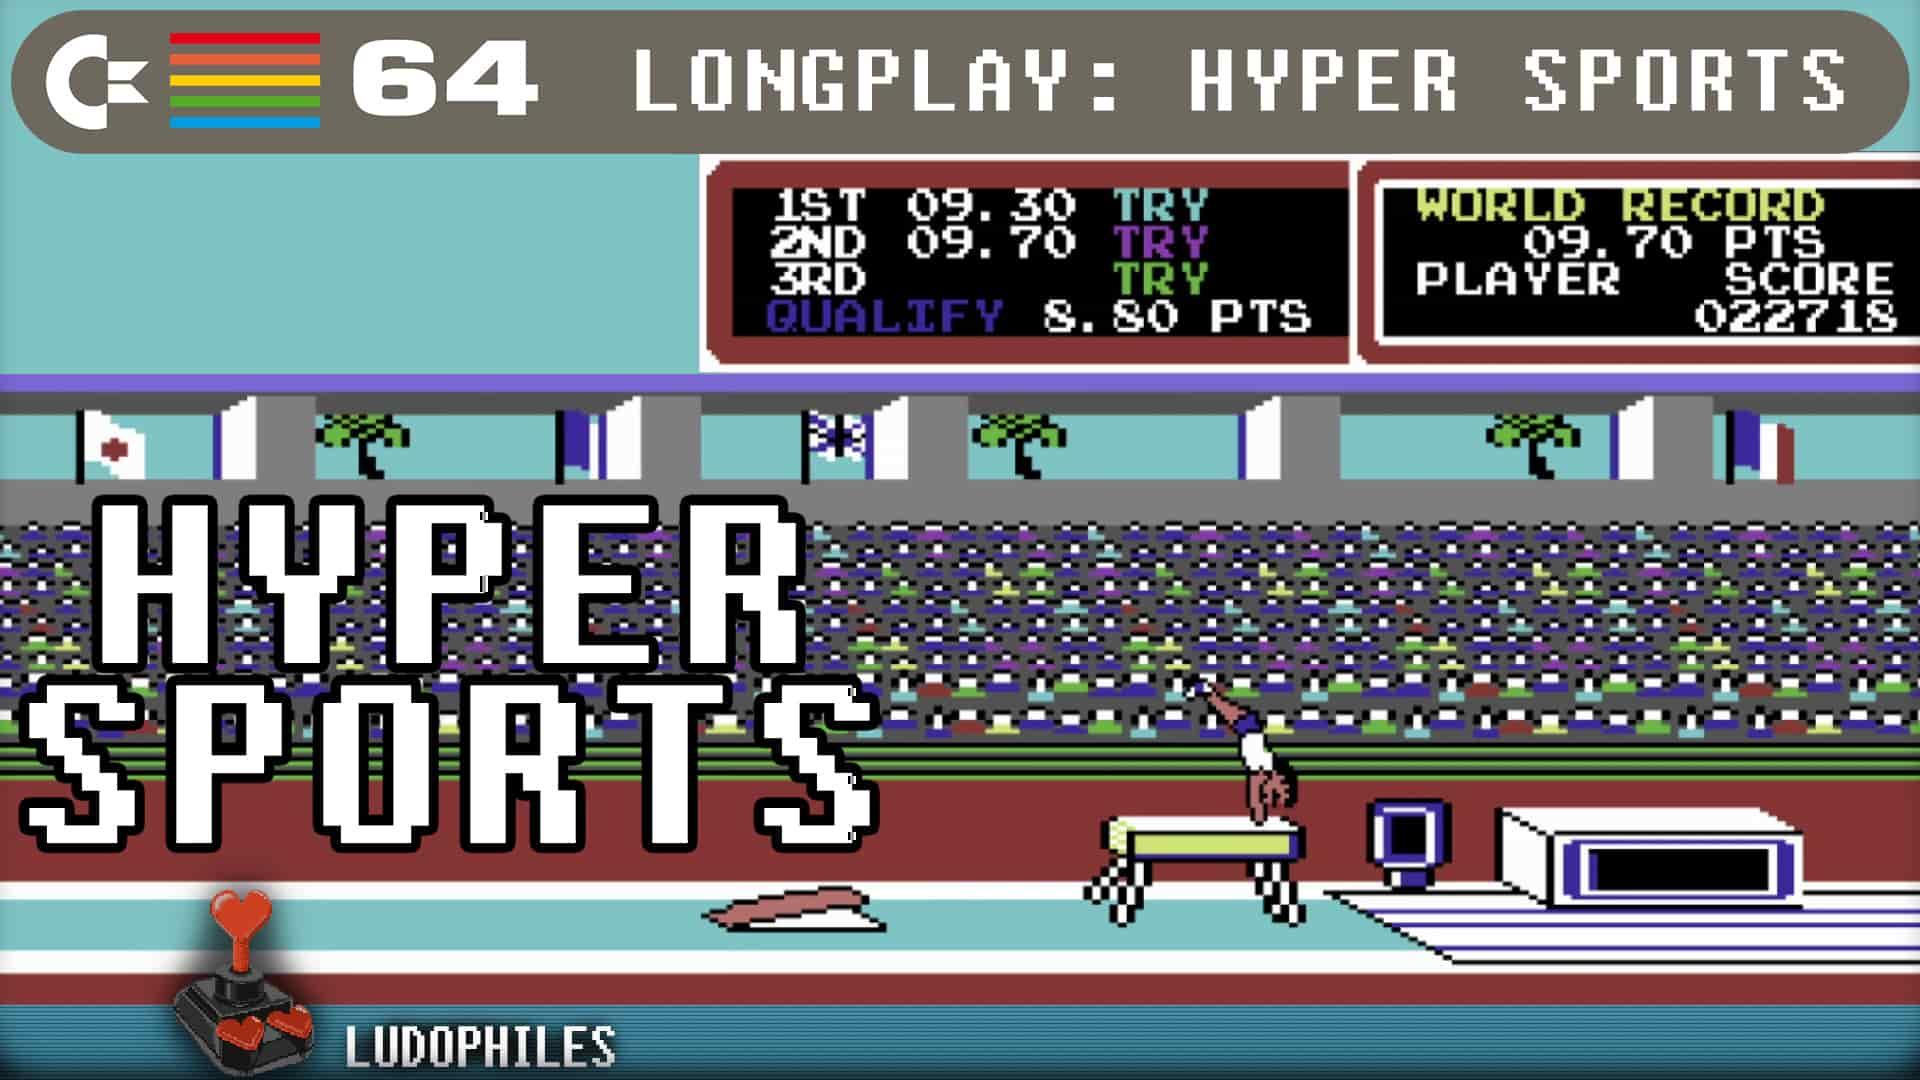 Hyper Sports C64 Longplay